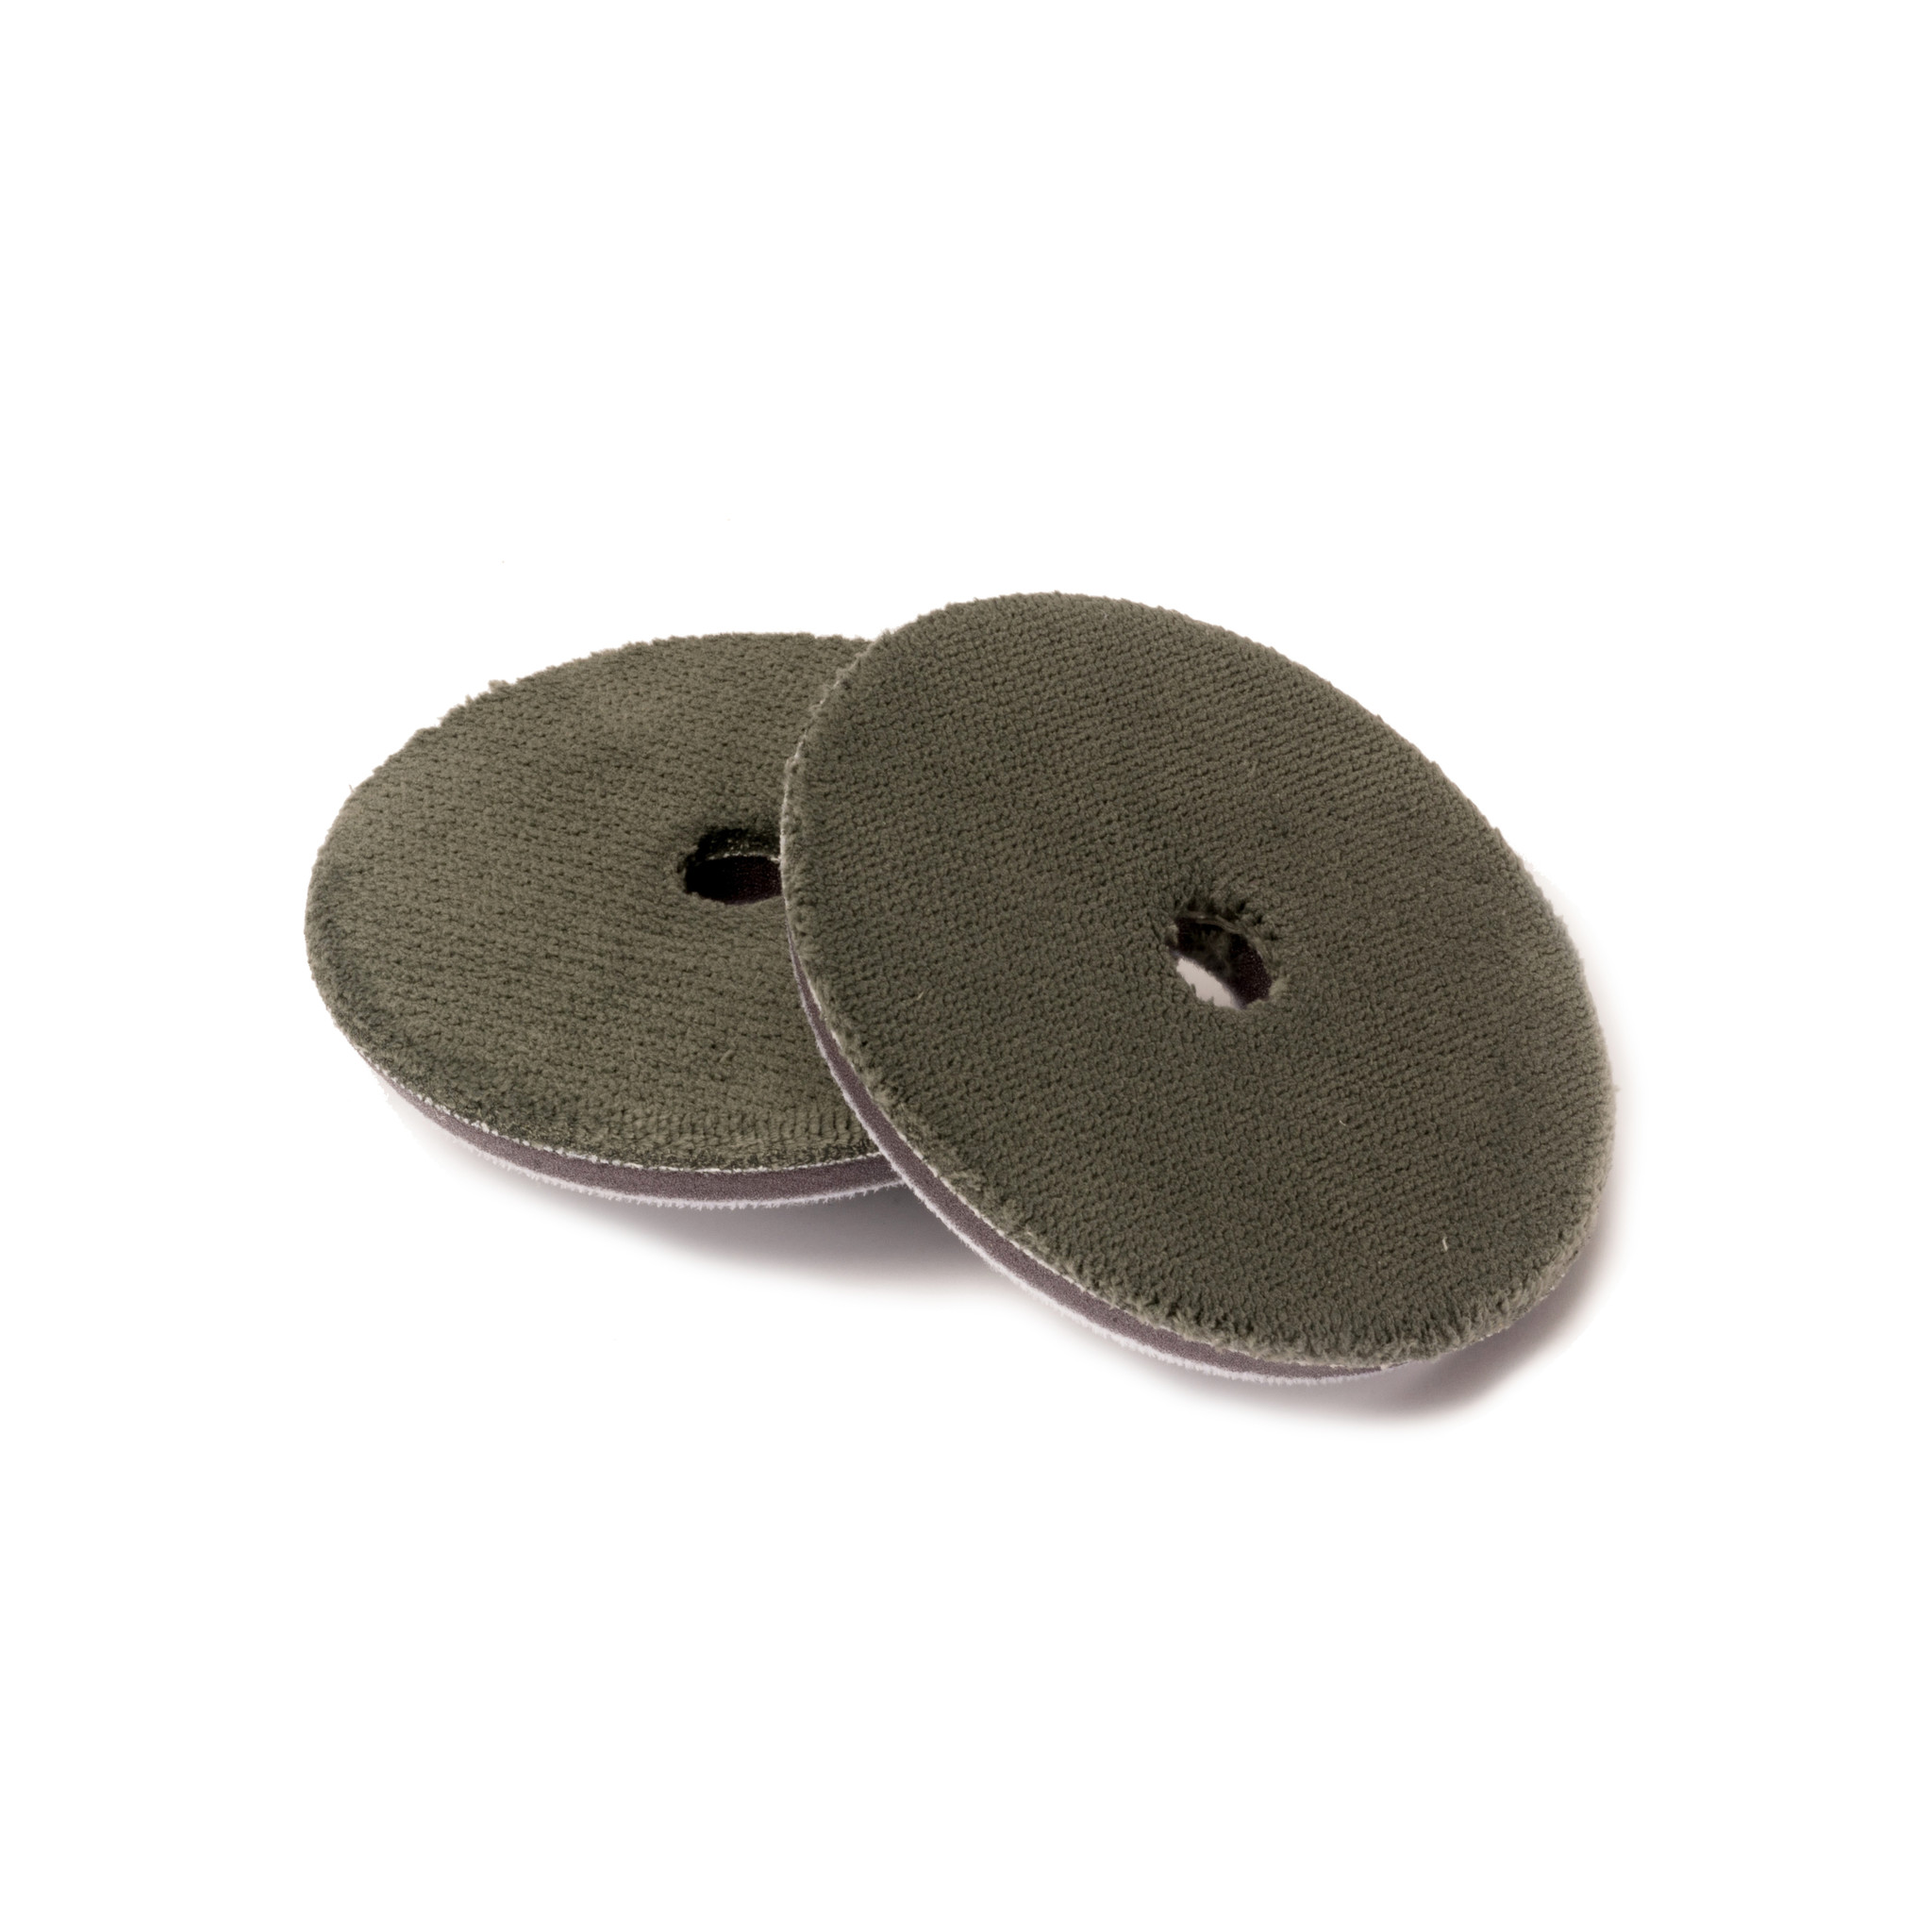 Ewocar Ewocar Microfiber Pad 100mm